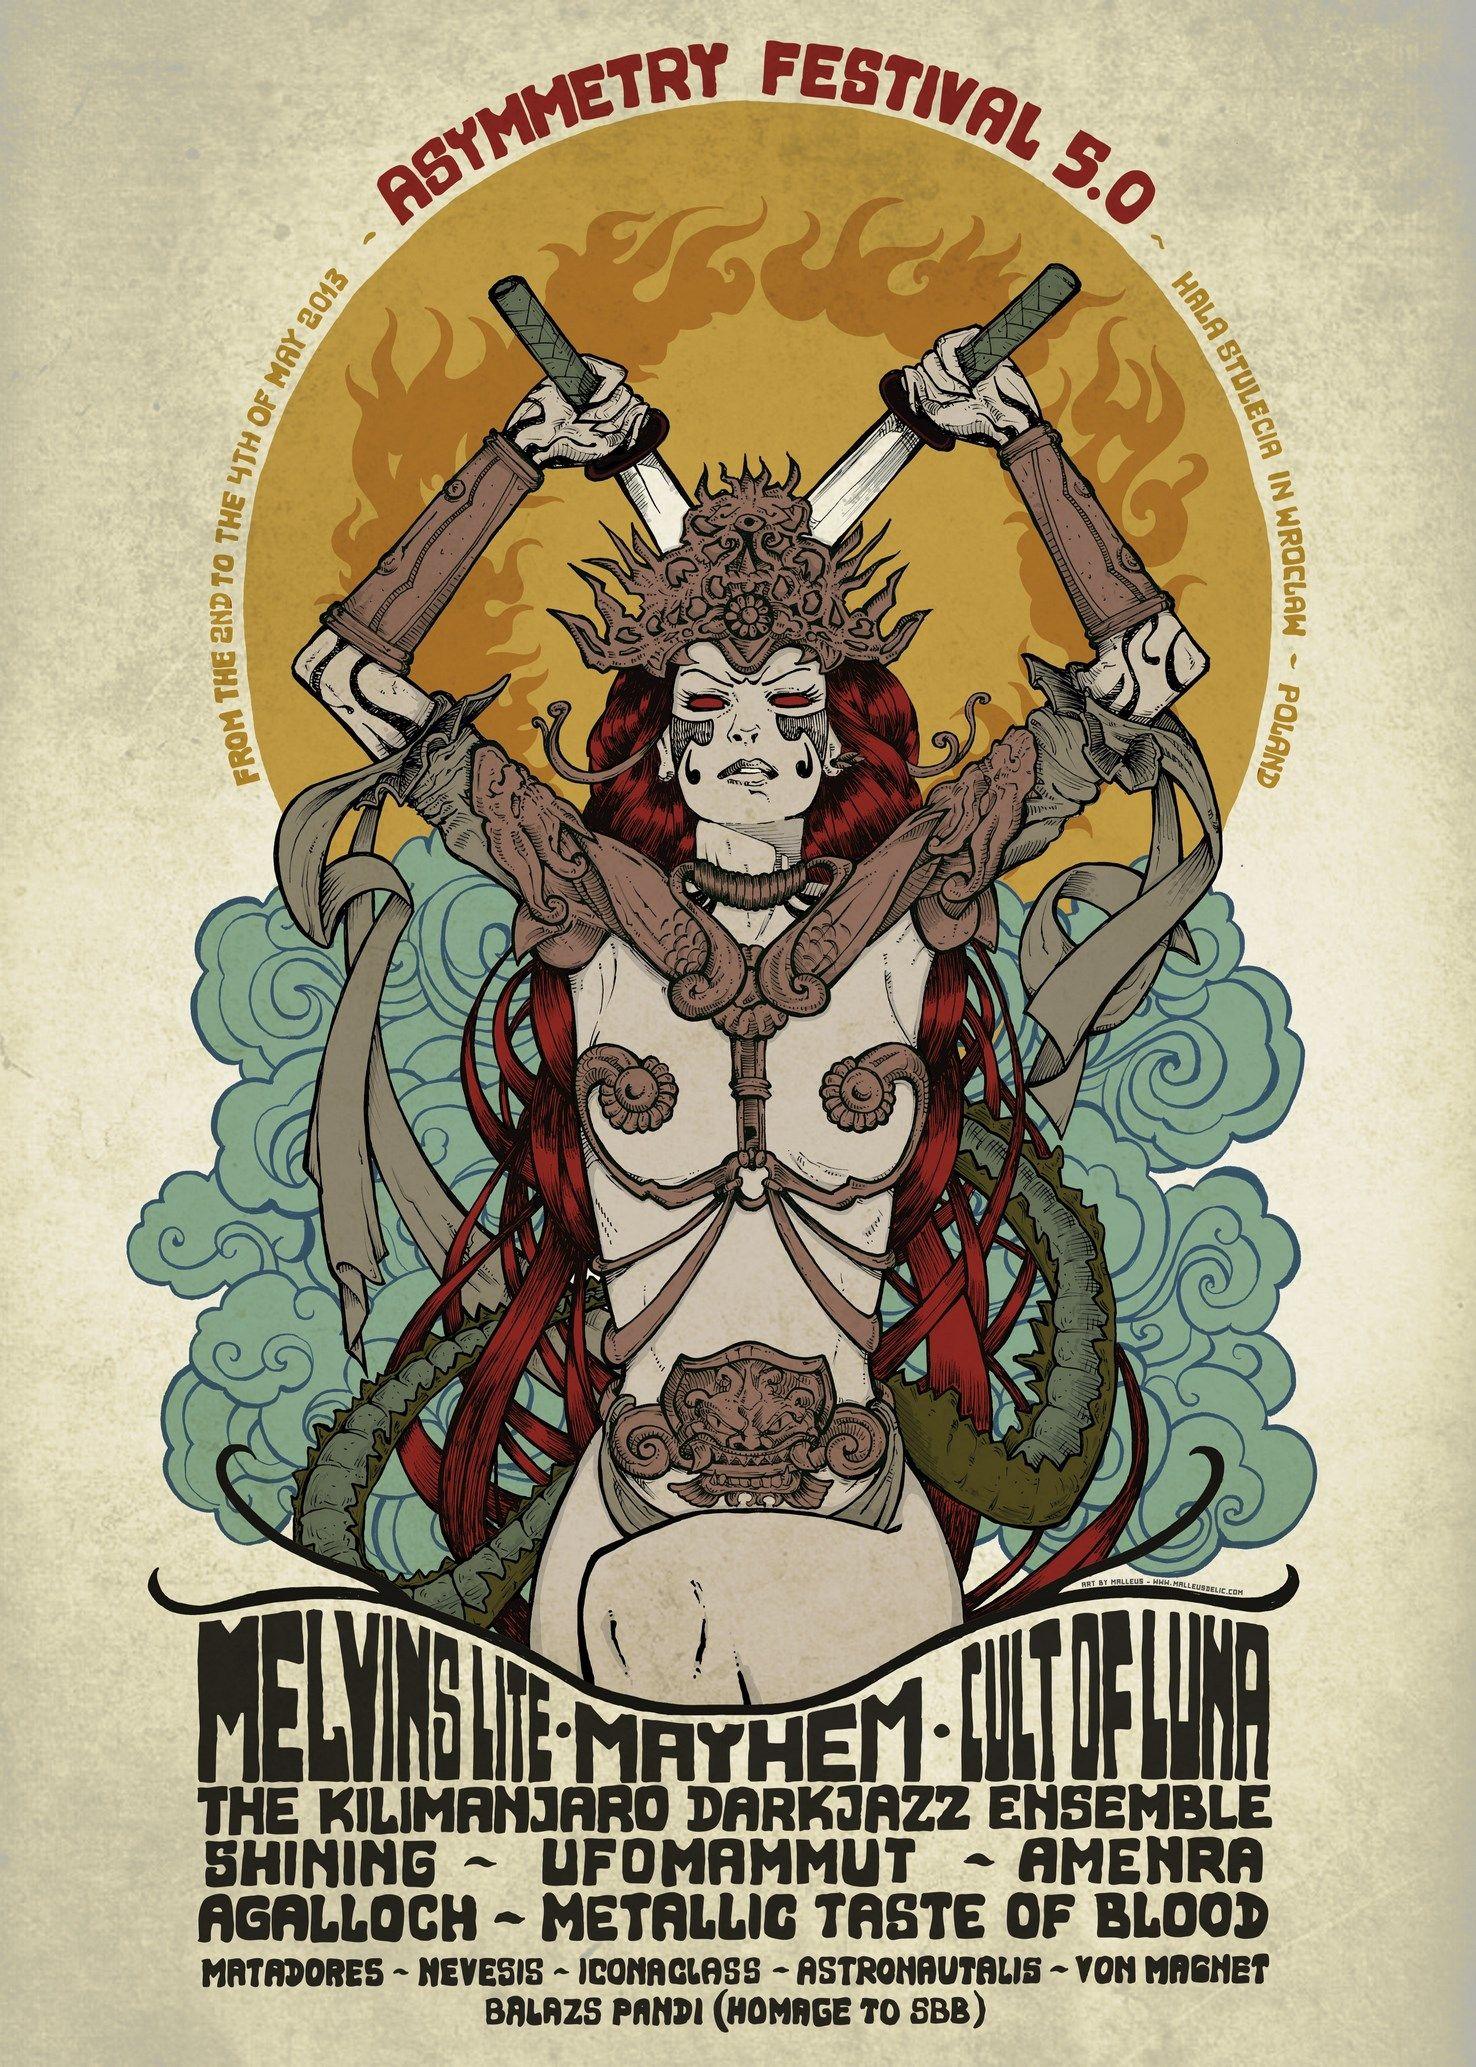 Melvins Lite, Mayhem, Cult Of Luna, The Kilimanjaro Darkjazz ...